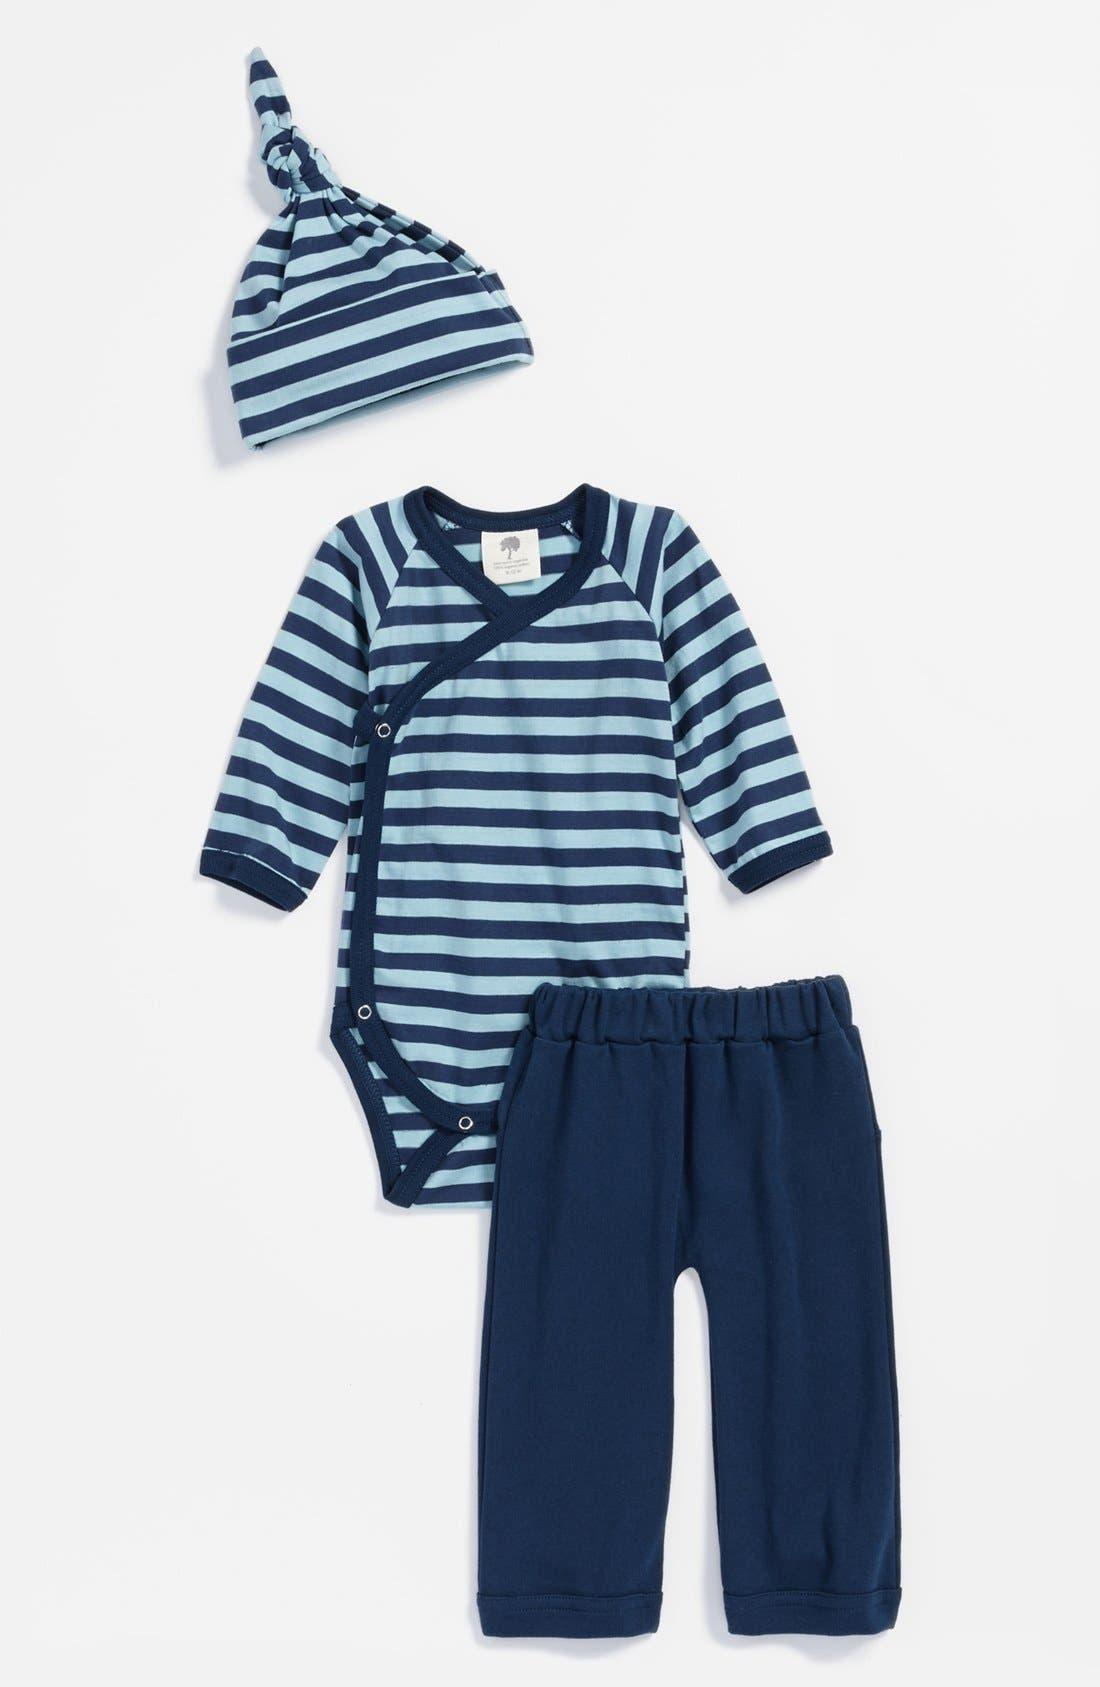 Main Image - Kate Quinn Organics 'Play' Bodysuit, Pants & Hat Set (Baby Boys)